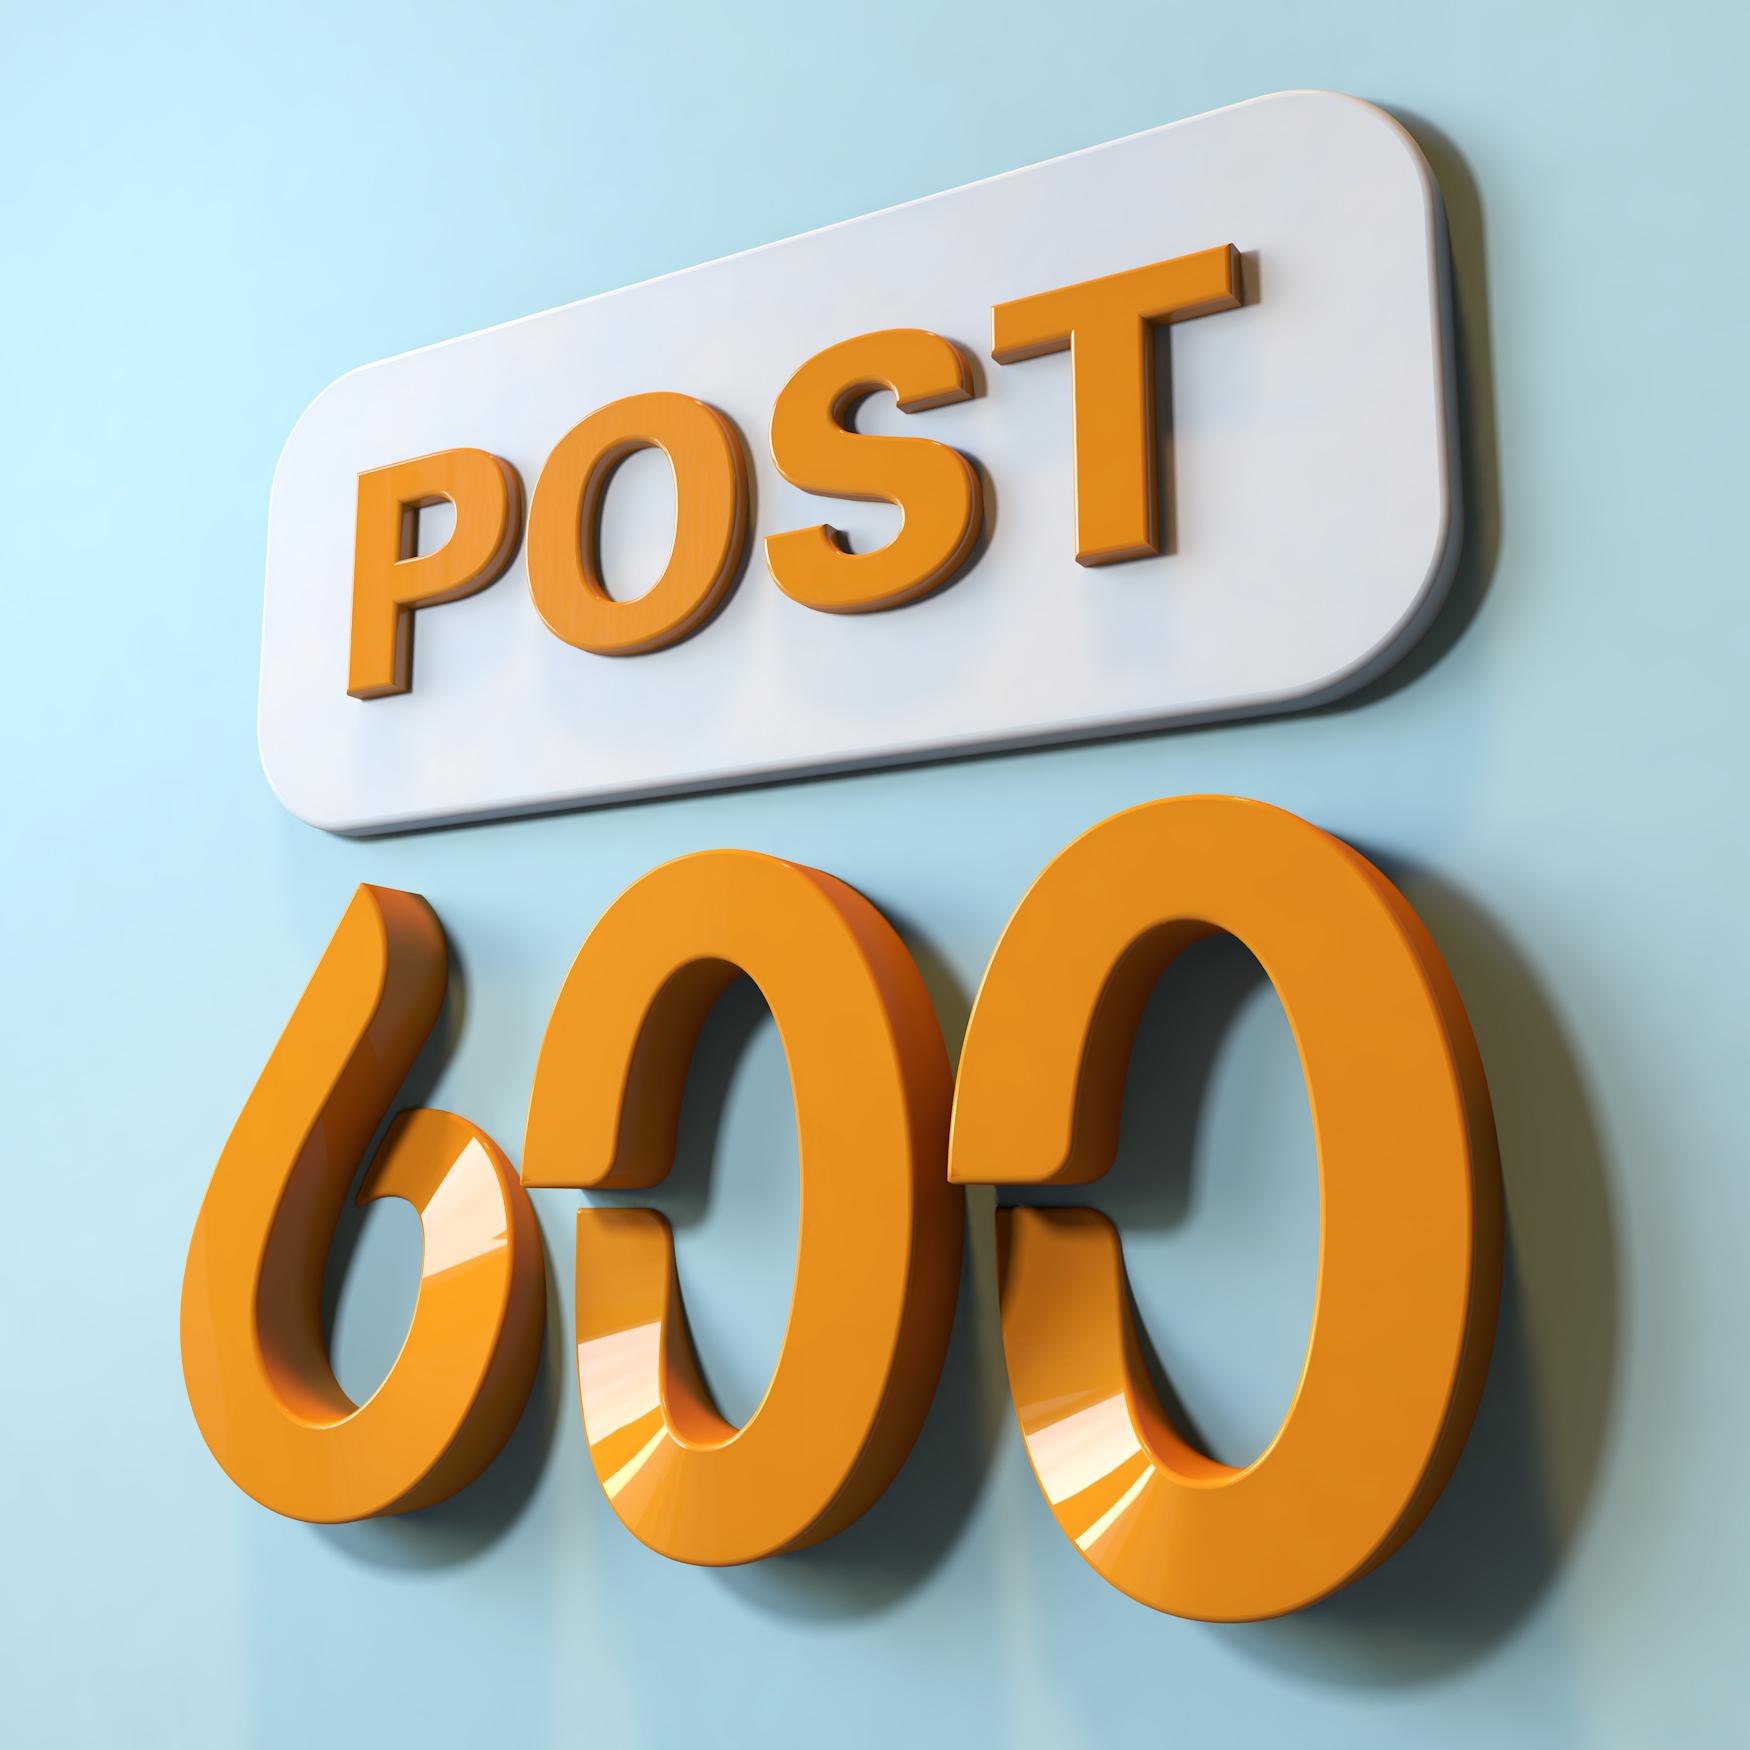 Post_600.jpg